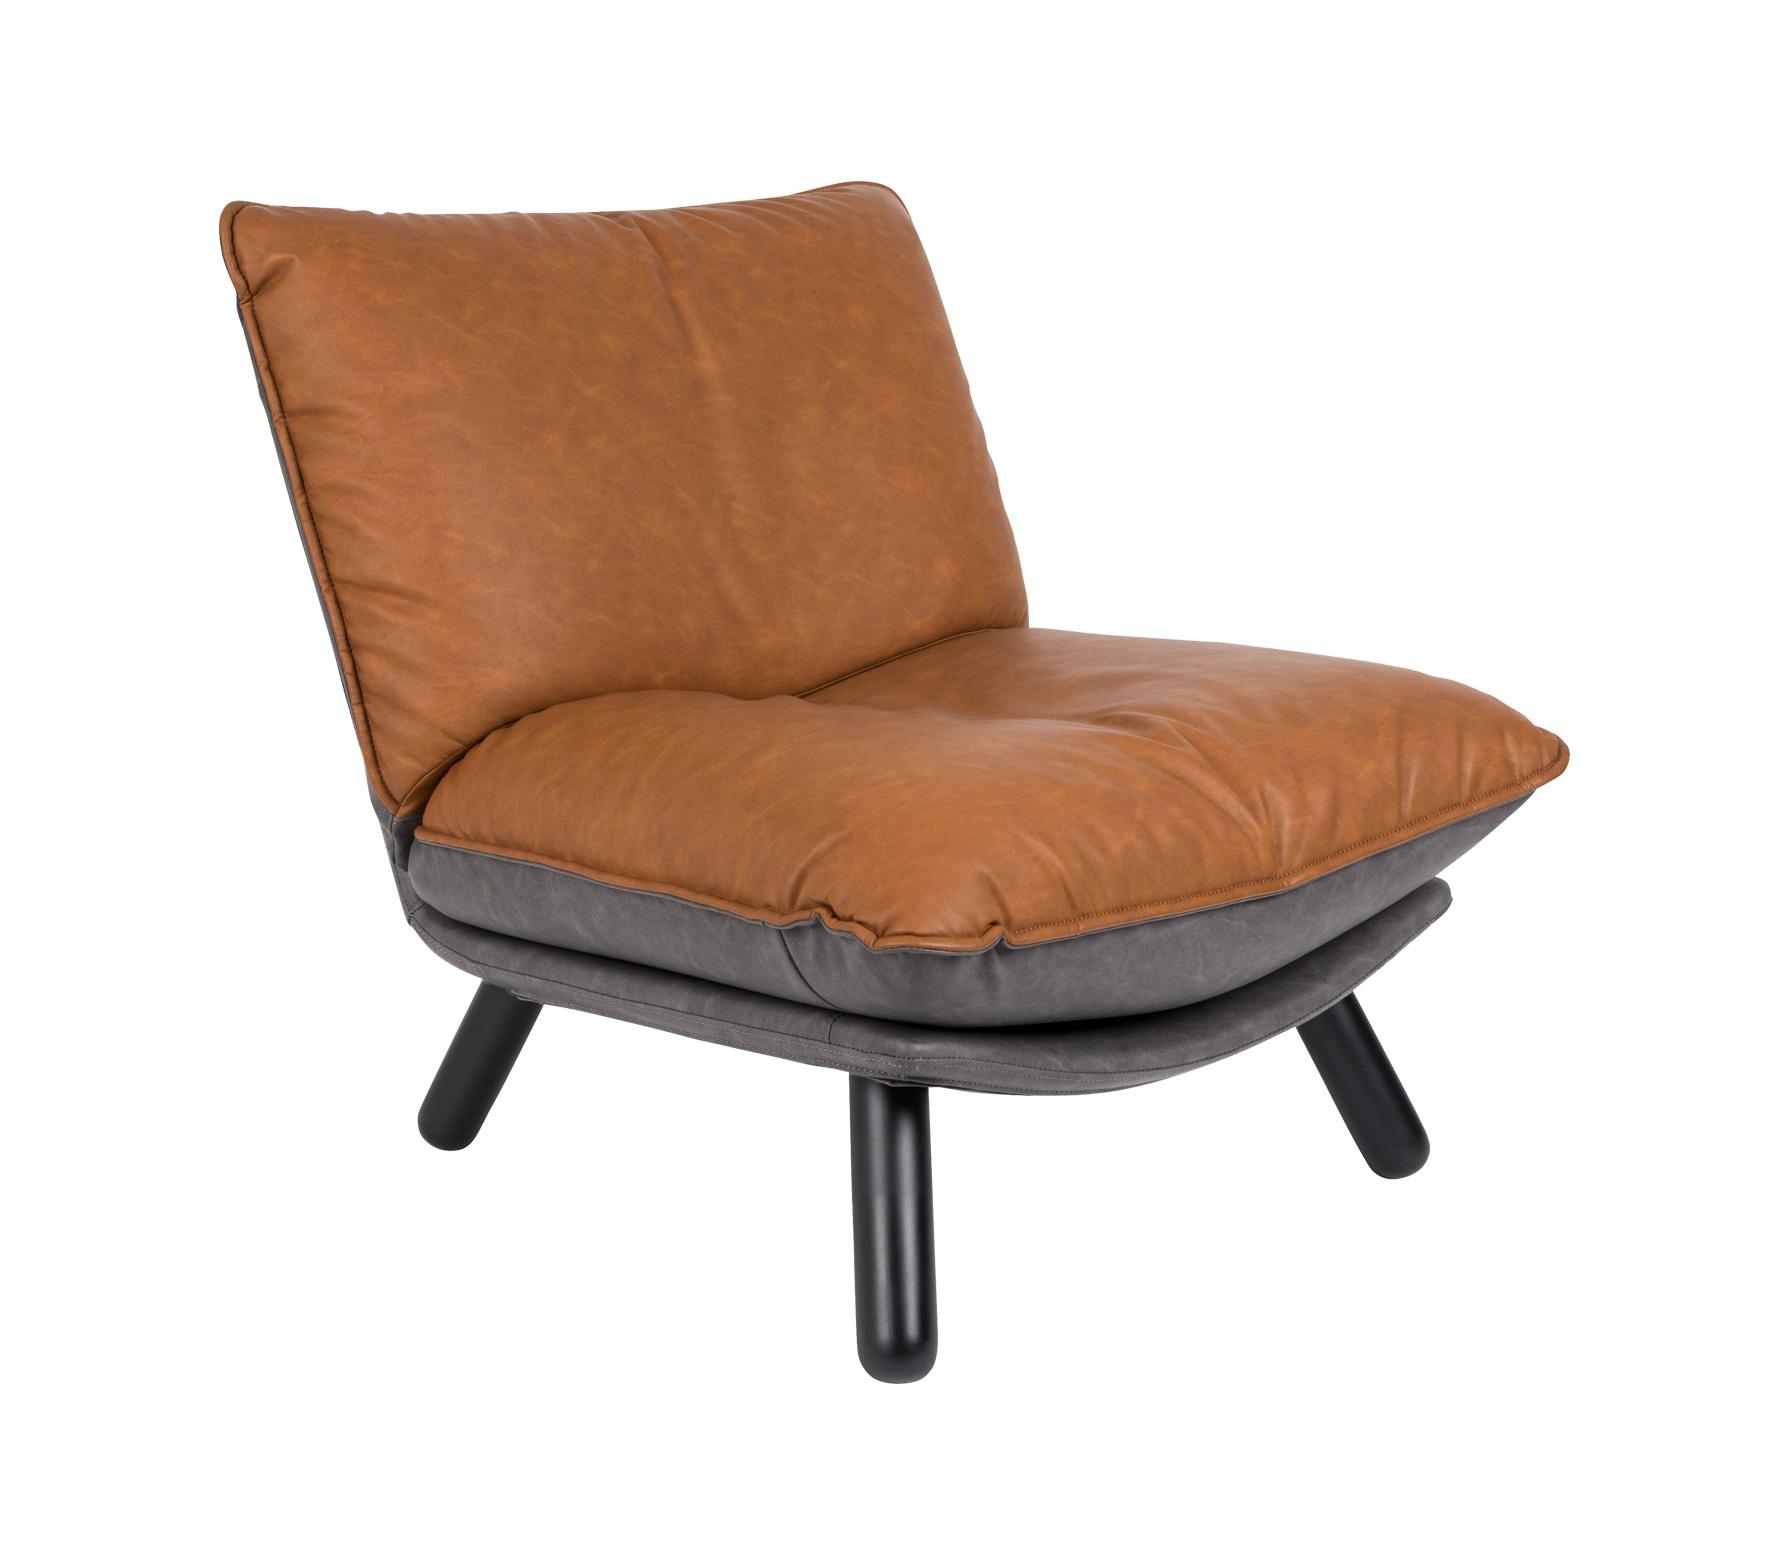 Zuiver lounge fauteuil Lazy Sack schuin vrijstaand